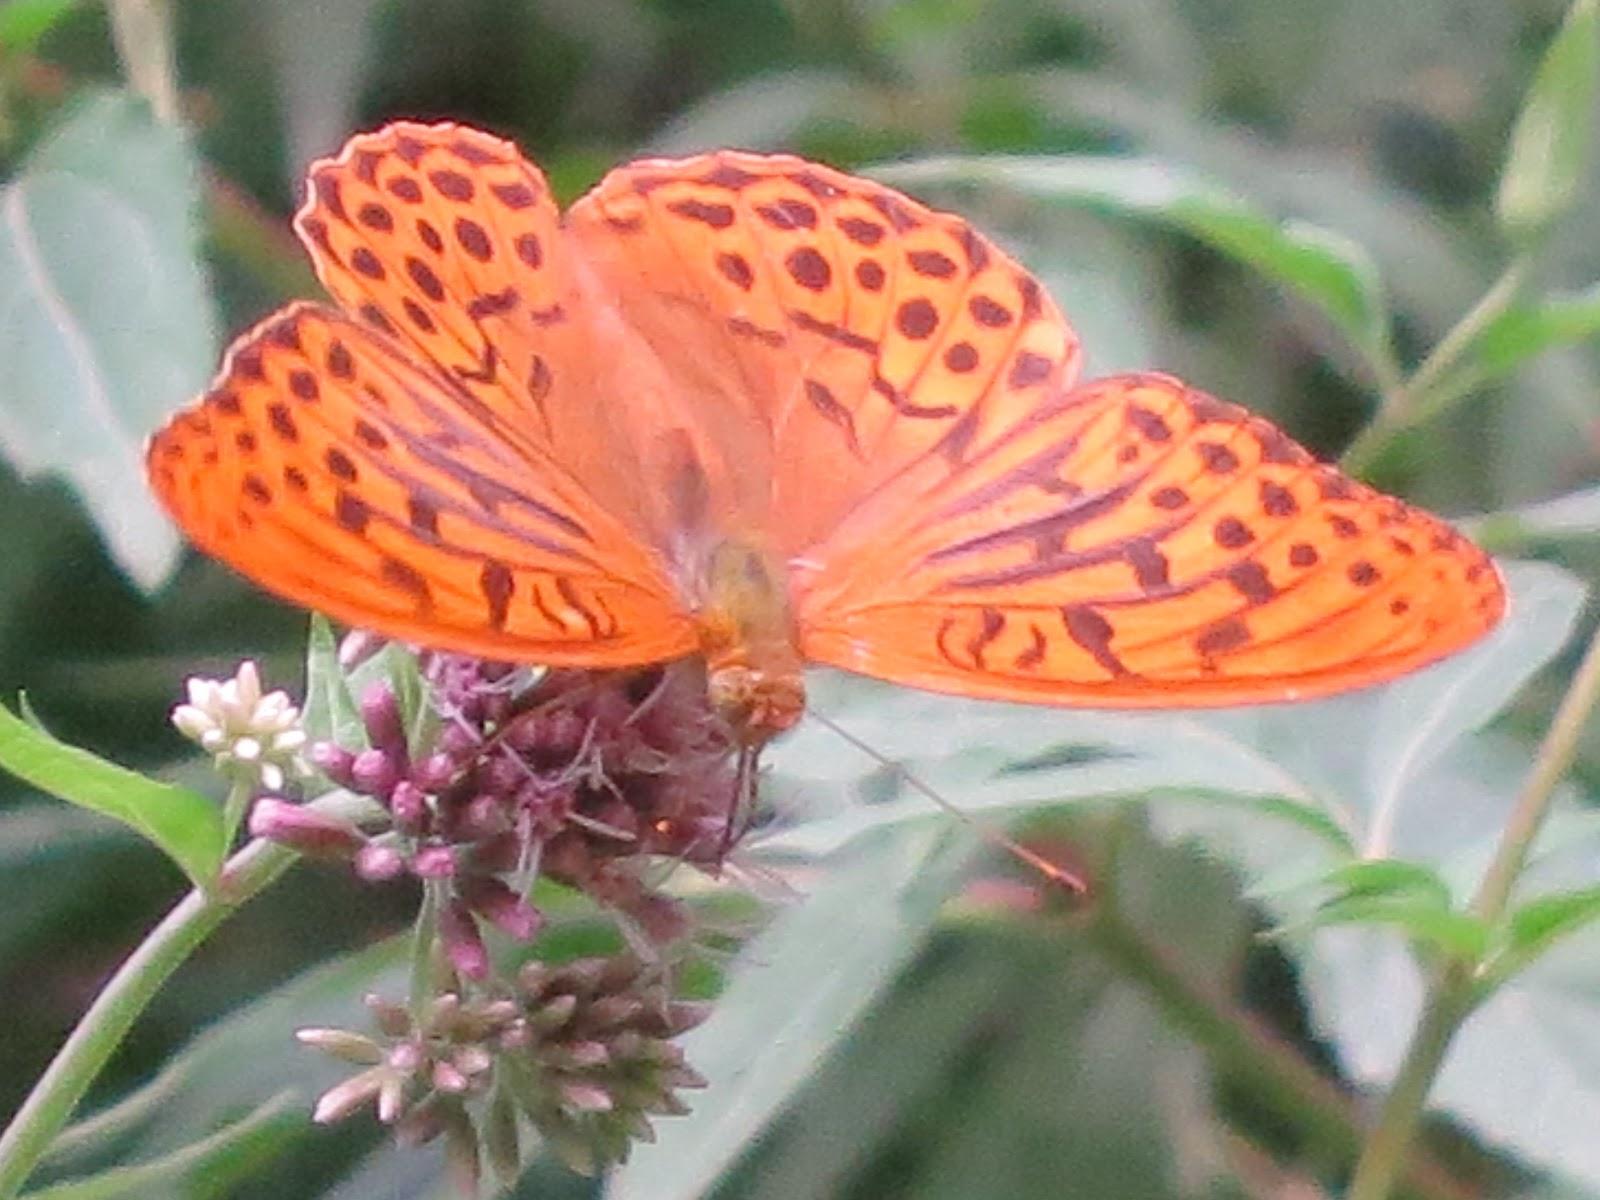 Les papallones diürnes de la Riera de Pineda (Alt Maresme)